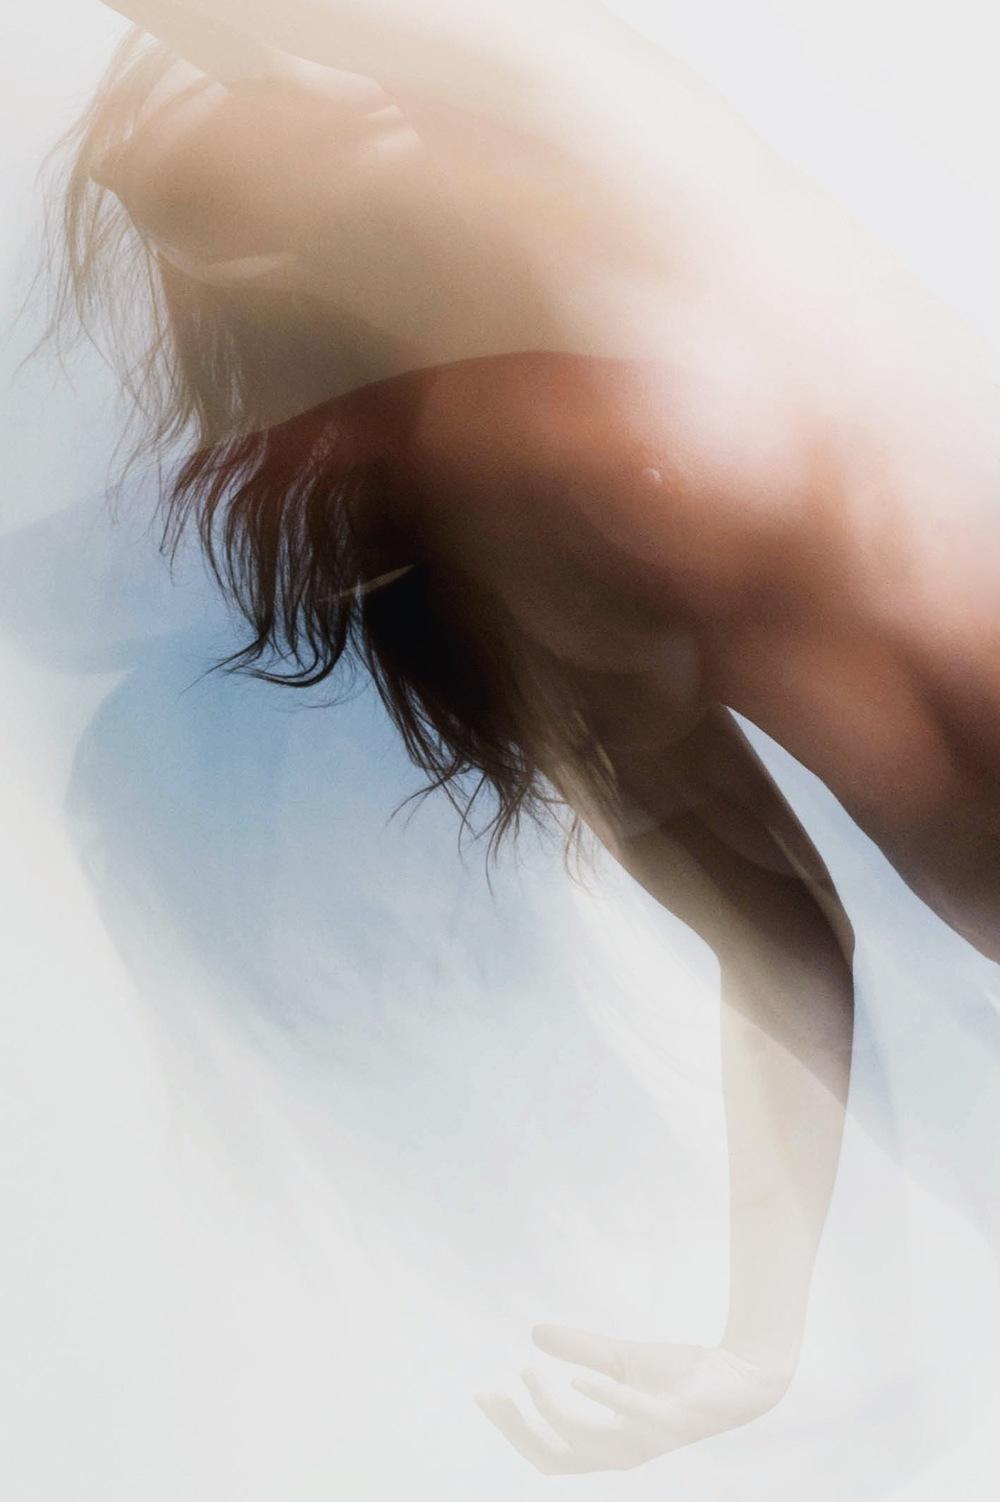 Alyssa-Adrian_Carmody-01.jpeg